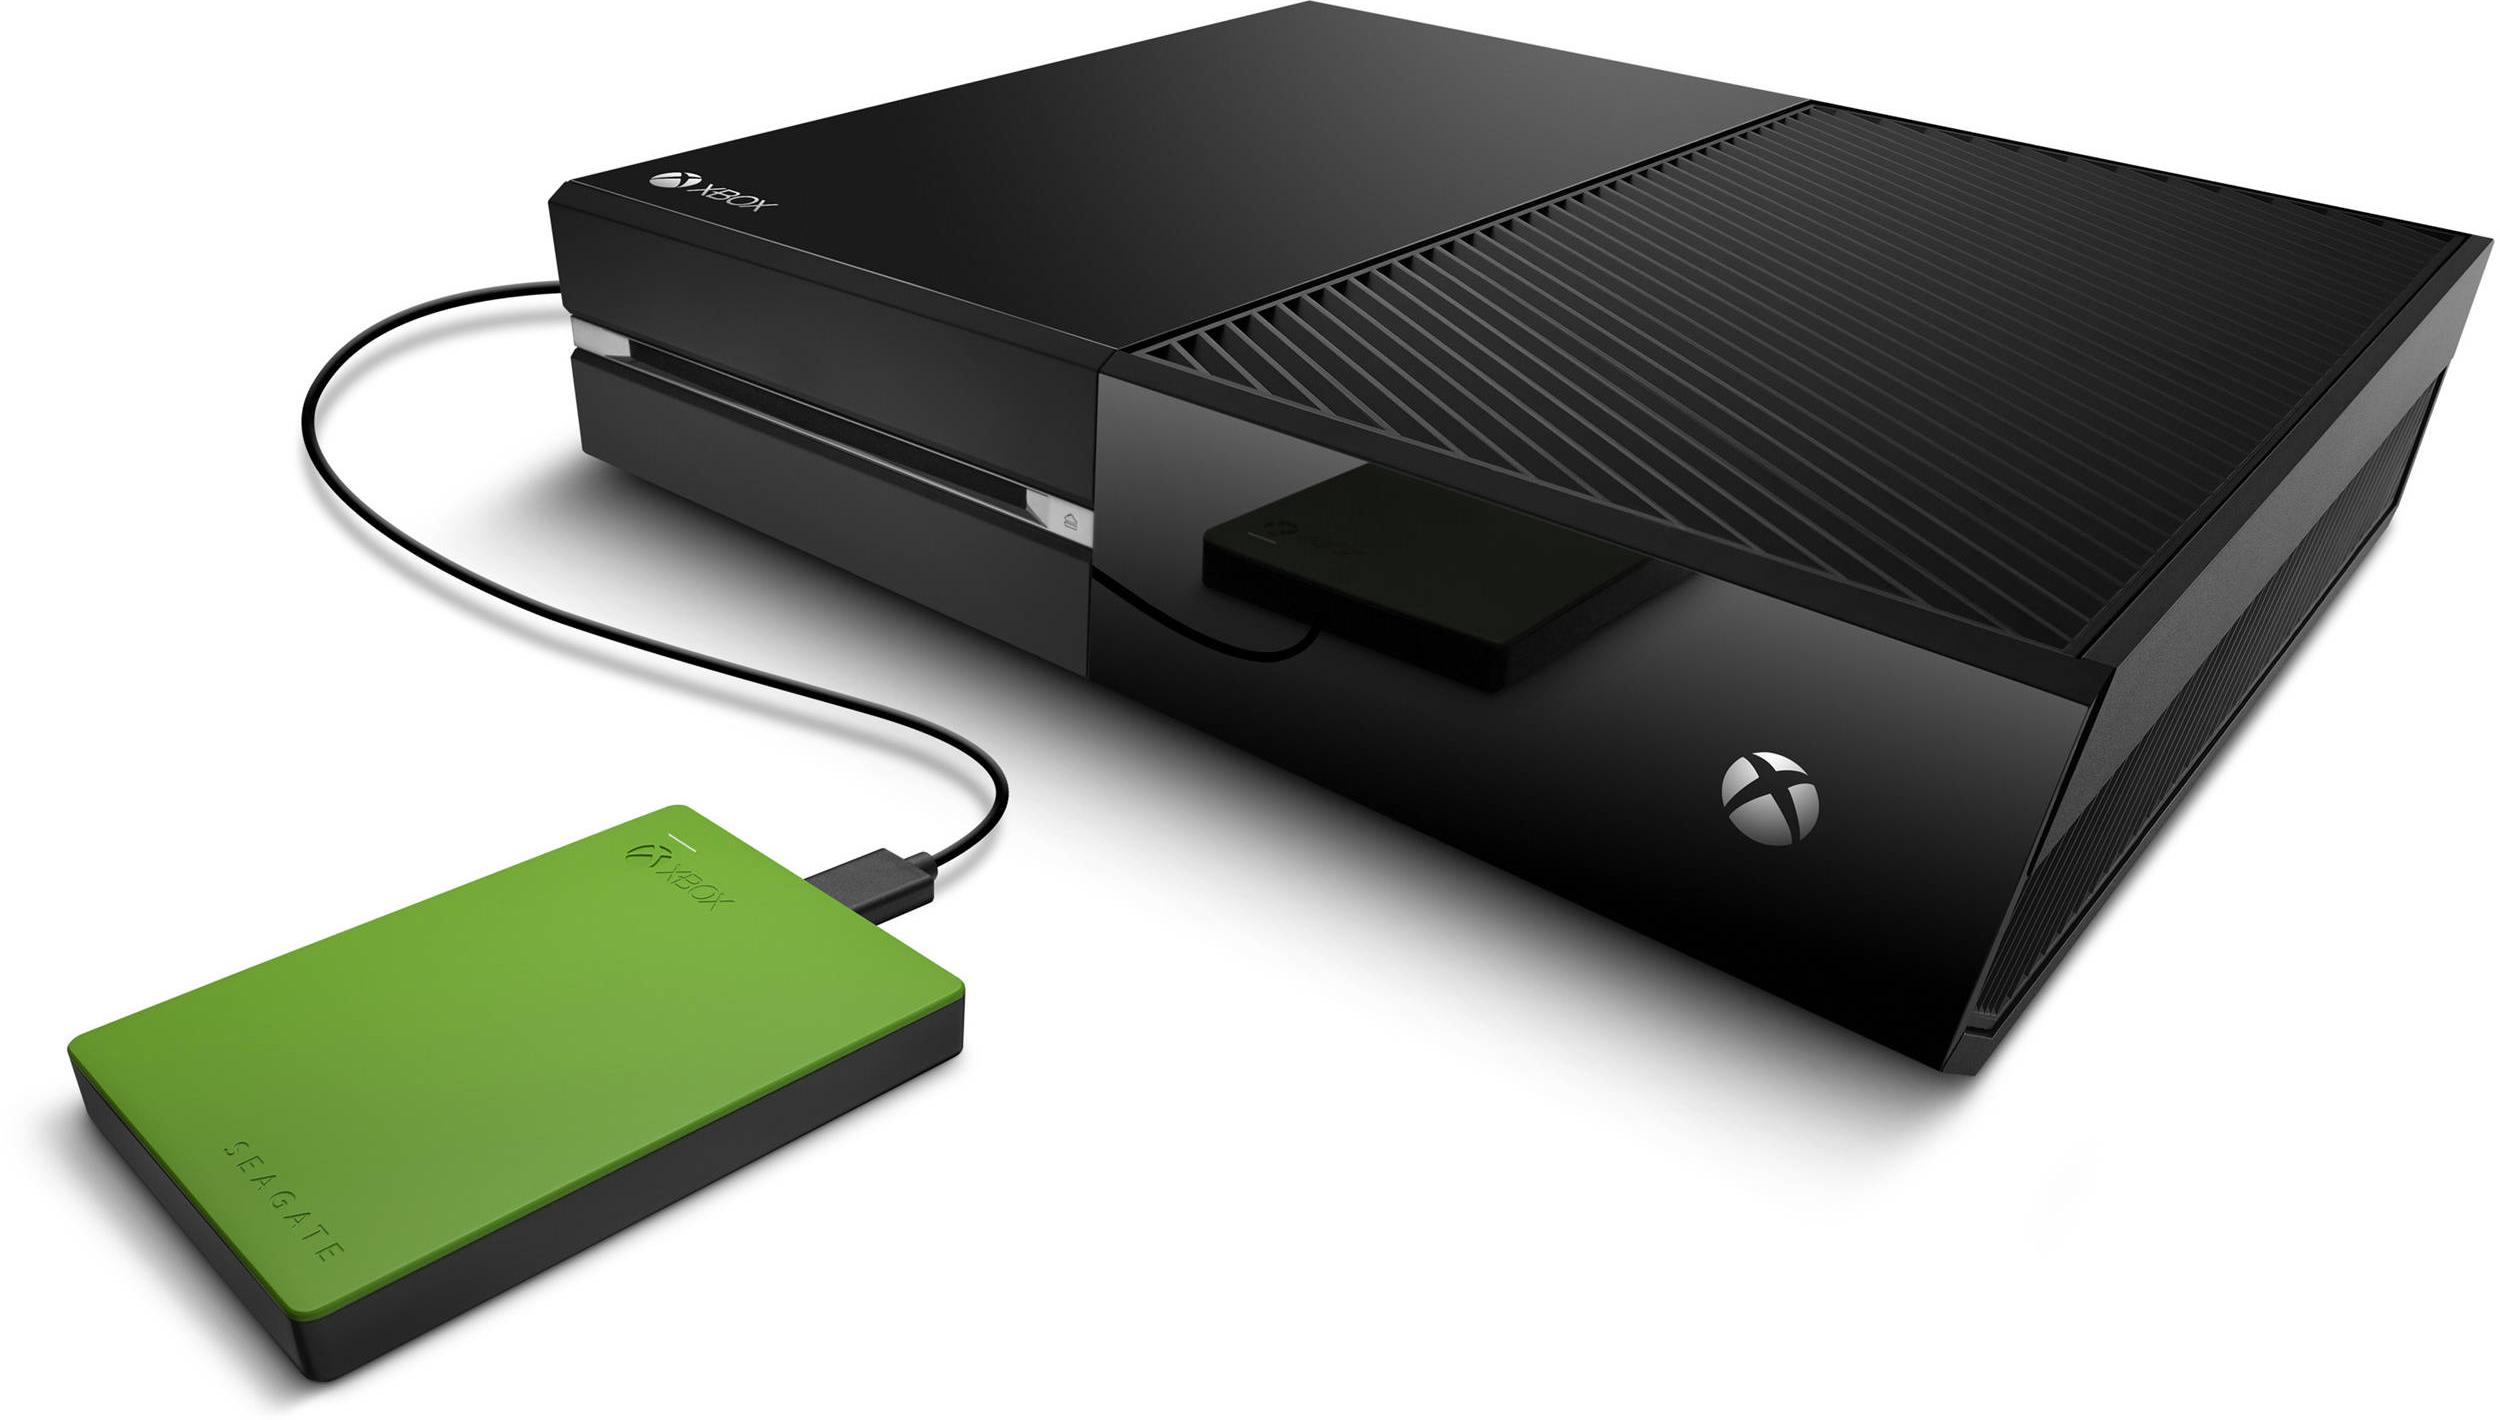 BLASTLOGIC PS4 PS3 XBOX ONE 360 WII U PS2